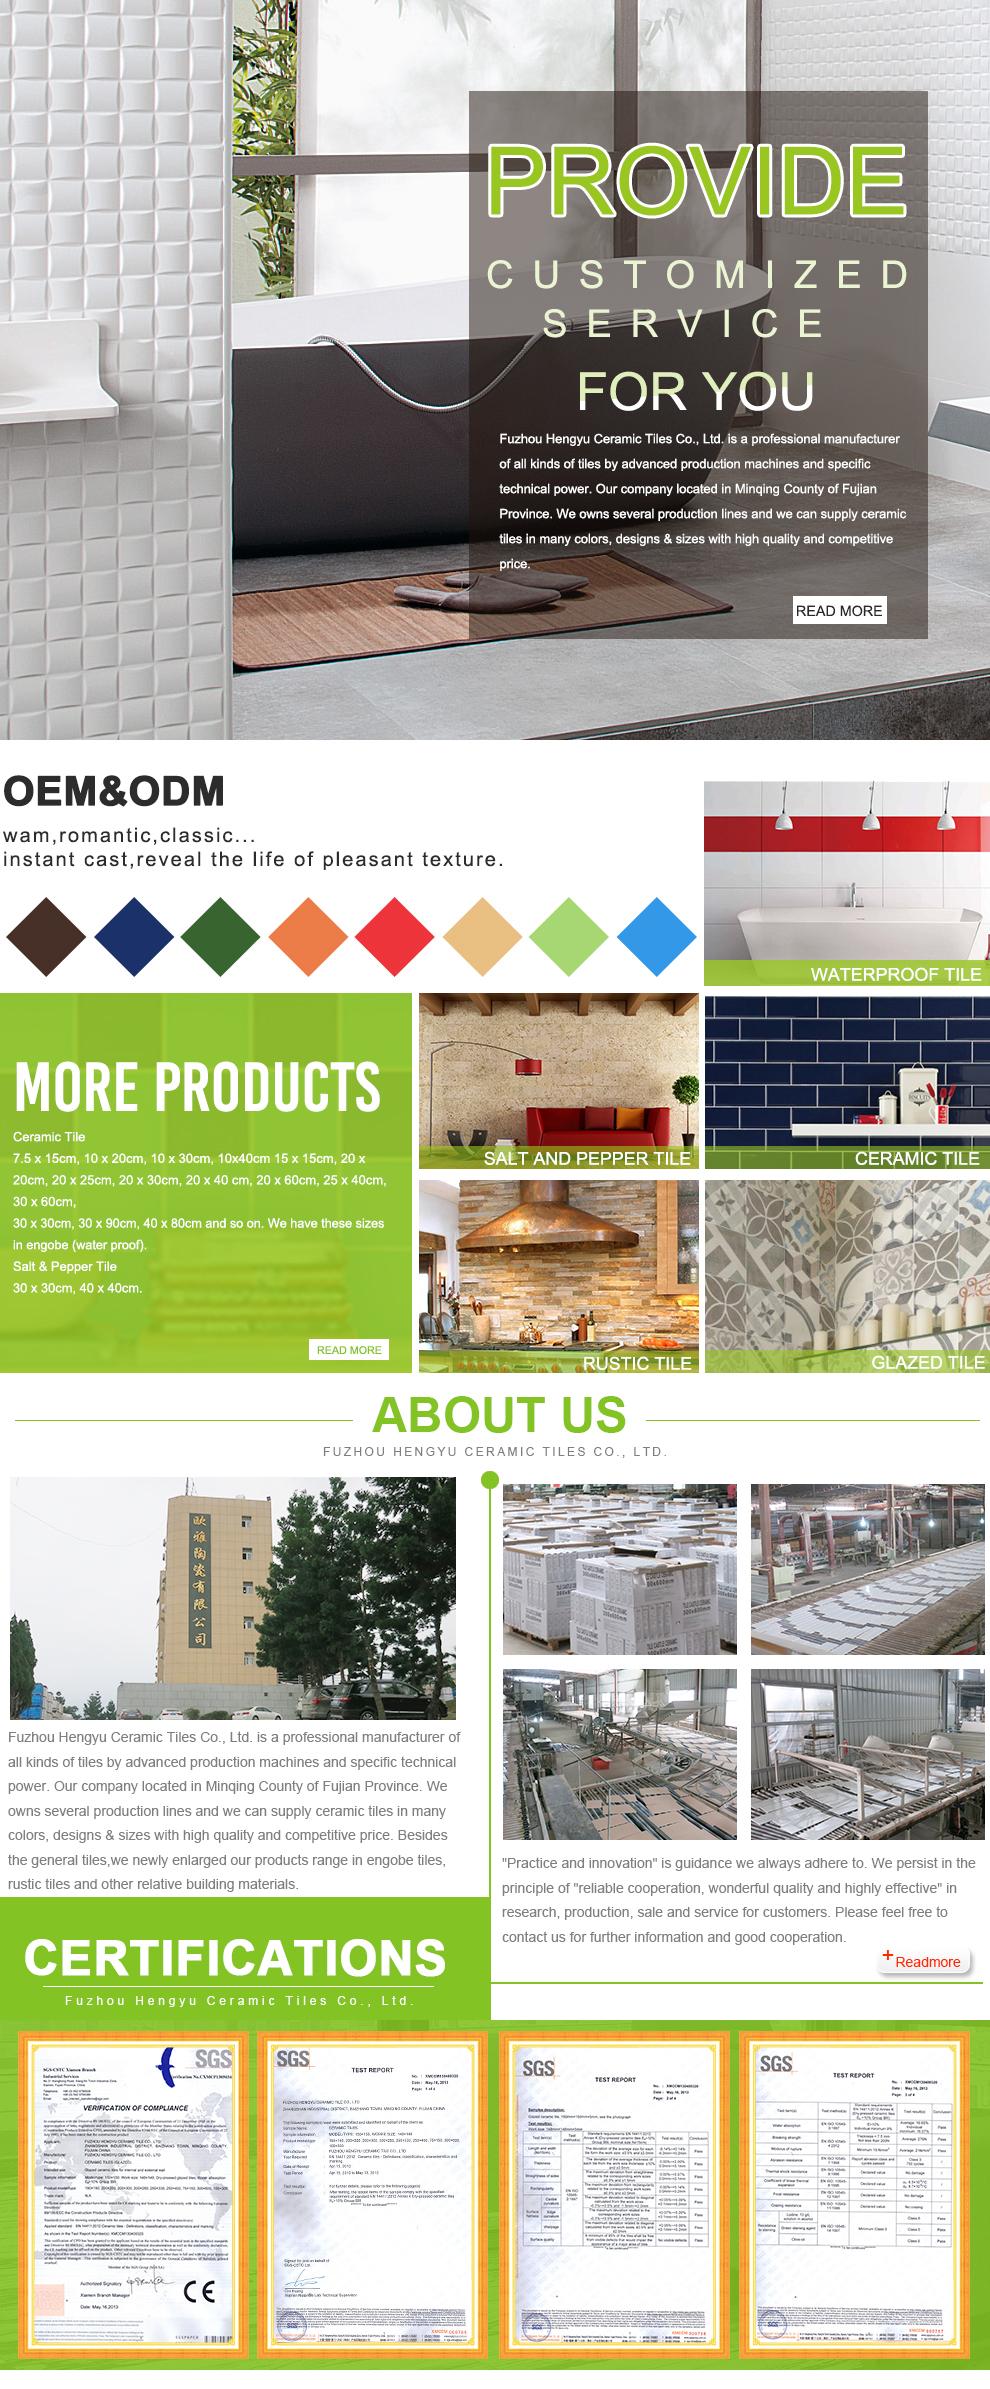 United states ceramic tile company manufacturer